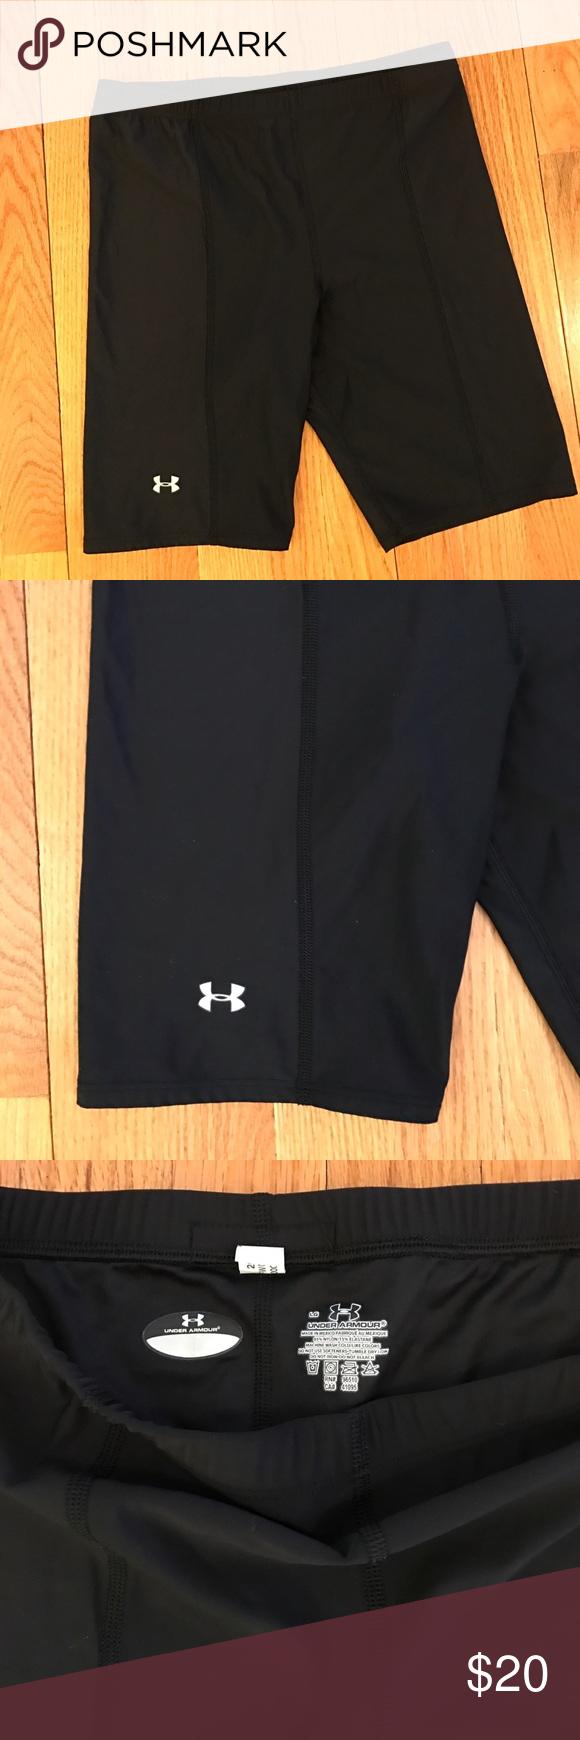 Men's Under Armour Compression Shorts Men's Under Armour Compression Shorts. Size Large. Black. 85% Nylon, 15% Elastane. Great condition. Under Armour Shorts